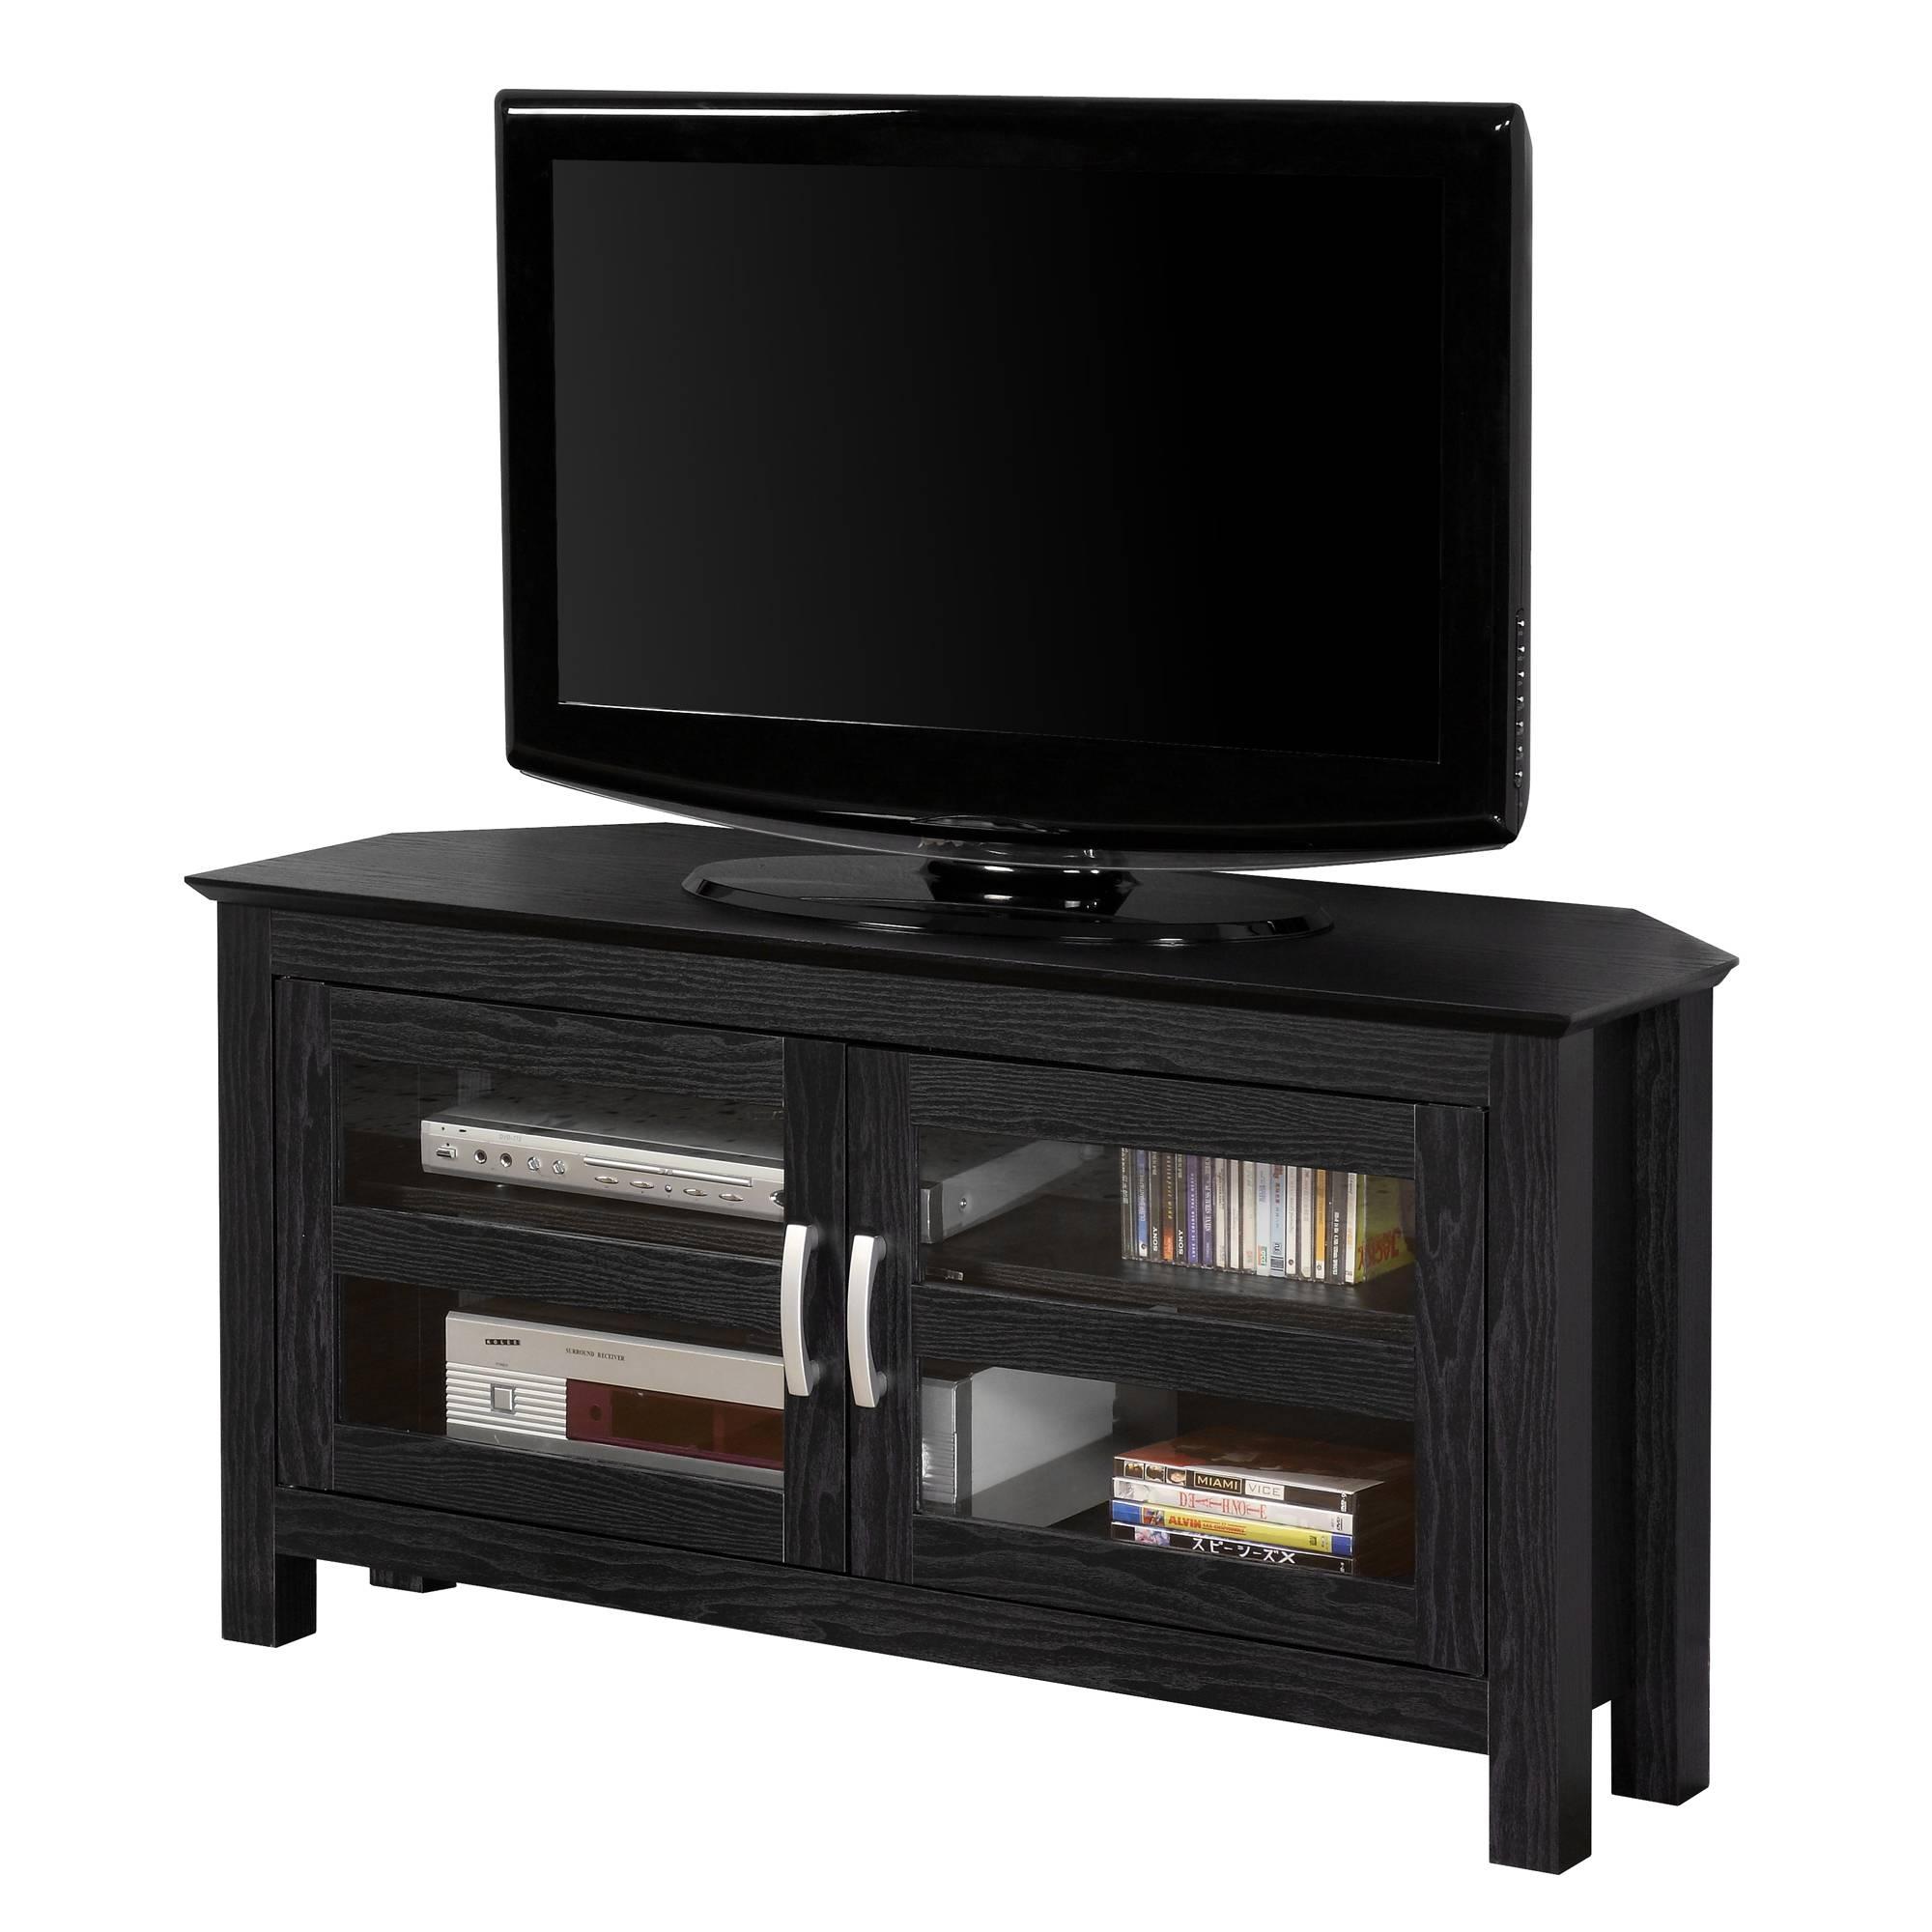 Wood Entertainment Center Corner Tv Stand Stereo Cabinet 44 inside Black Wood Corner Tv Stands (Image 15 of 15)